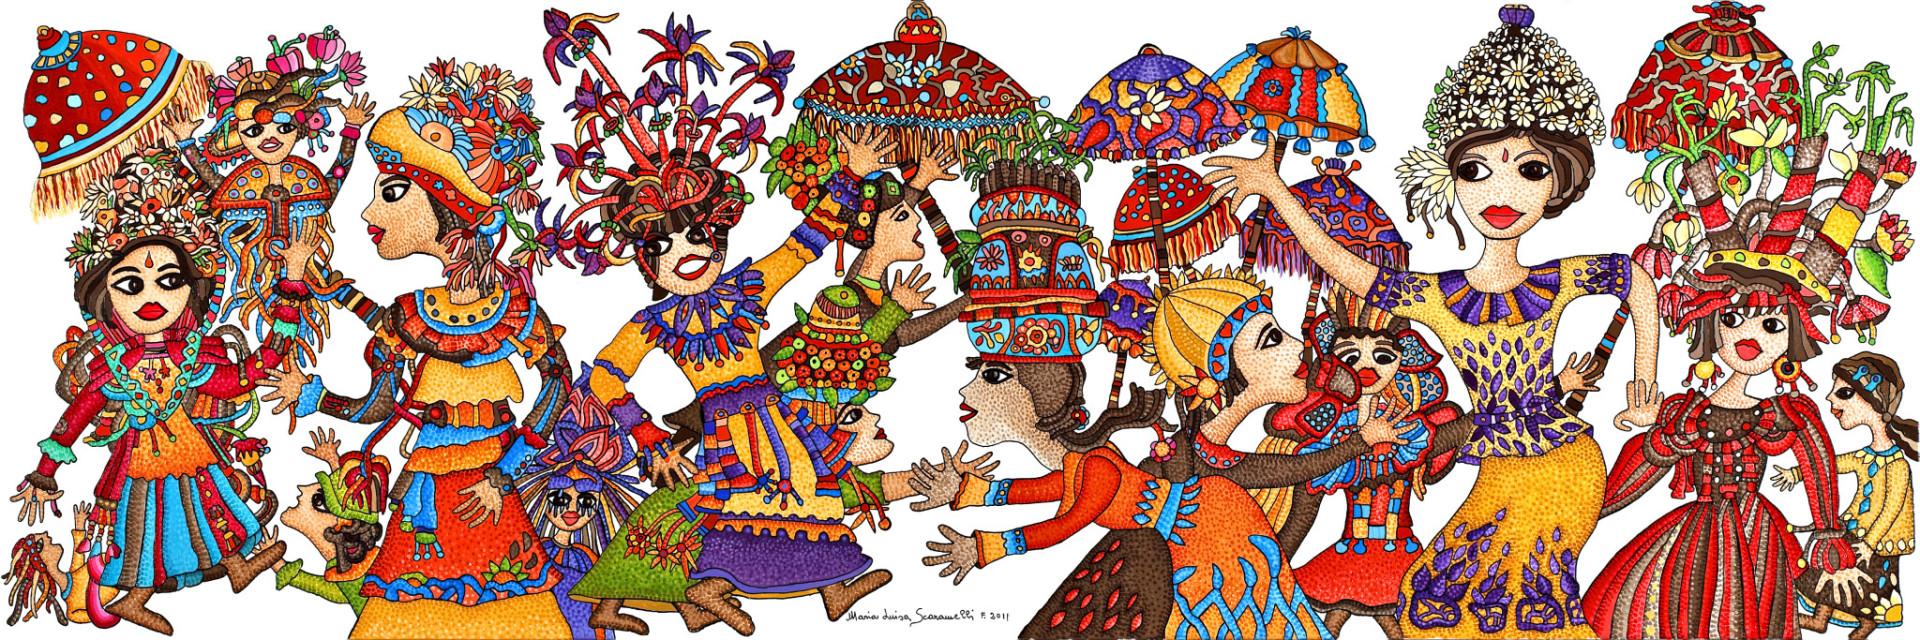 Spiriti danzanti III